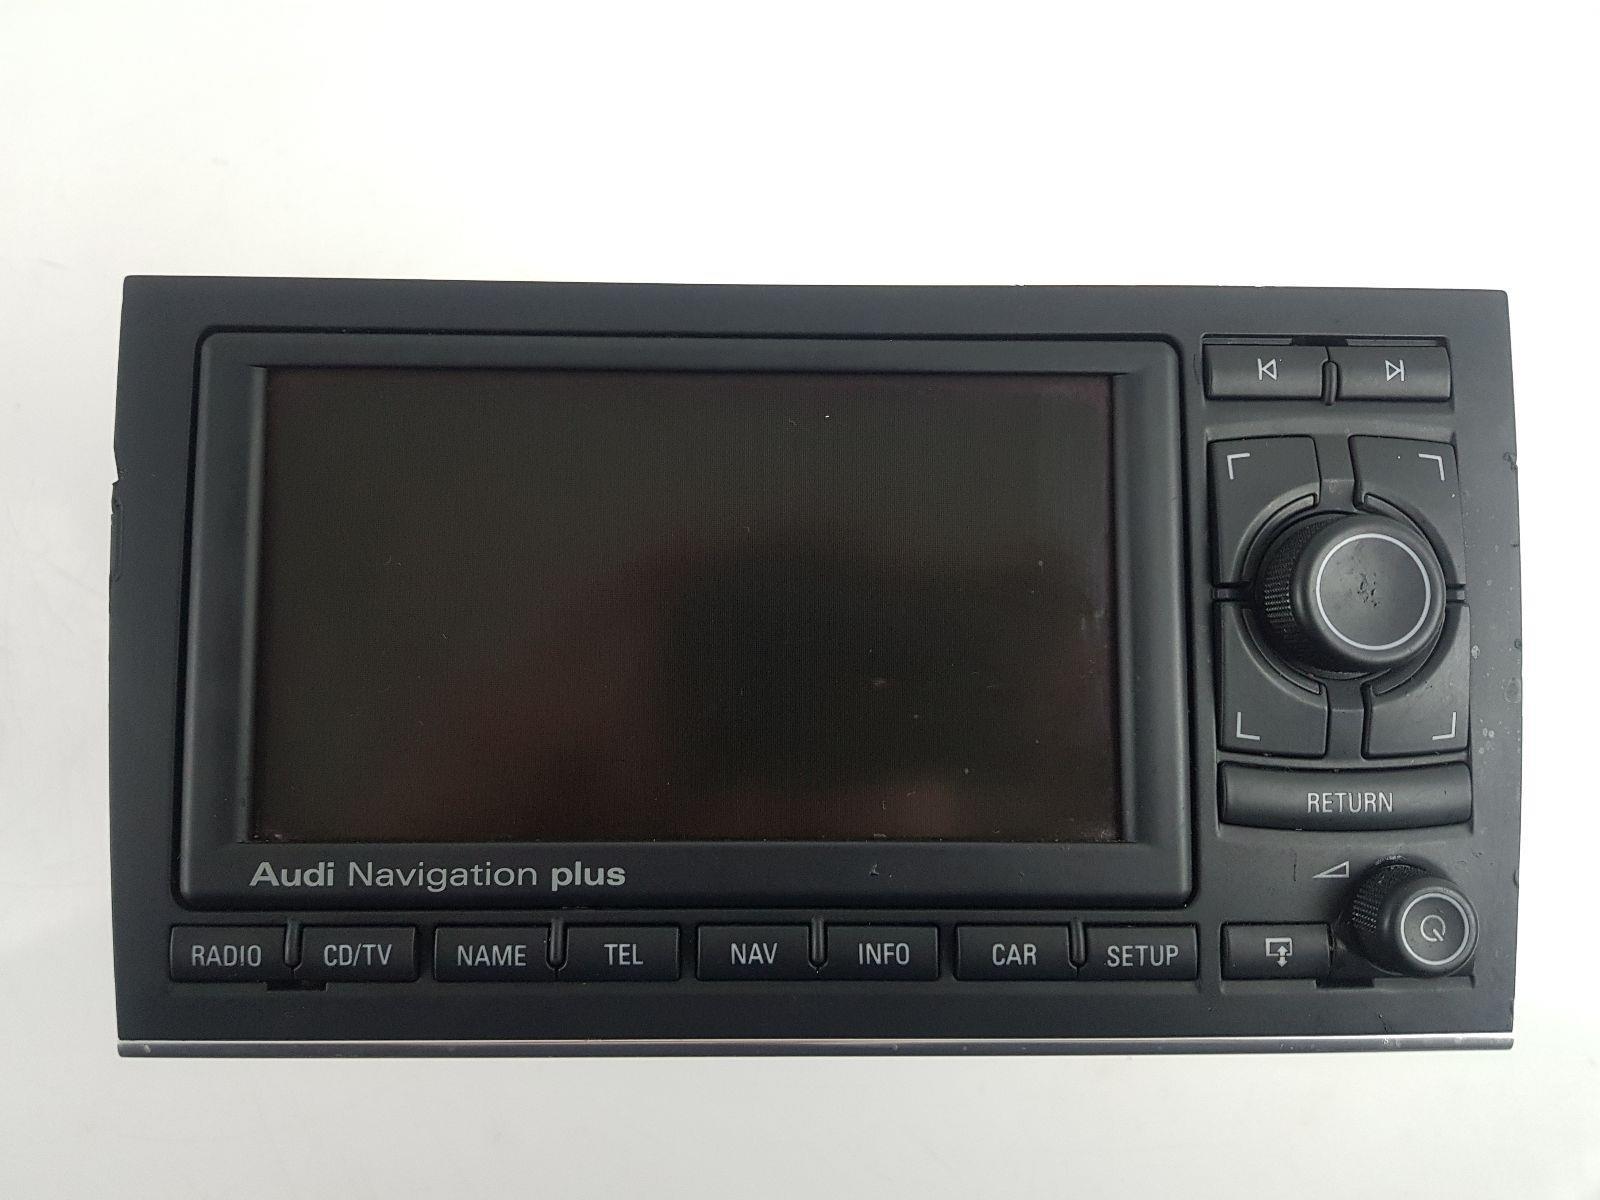 audi a4 2001 to 2005 satellite navigation cd unit diesel manual rh scbvehicledismantlers co uk Audi RNs E 2013 Audi A4 Navigation System Upgrade